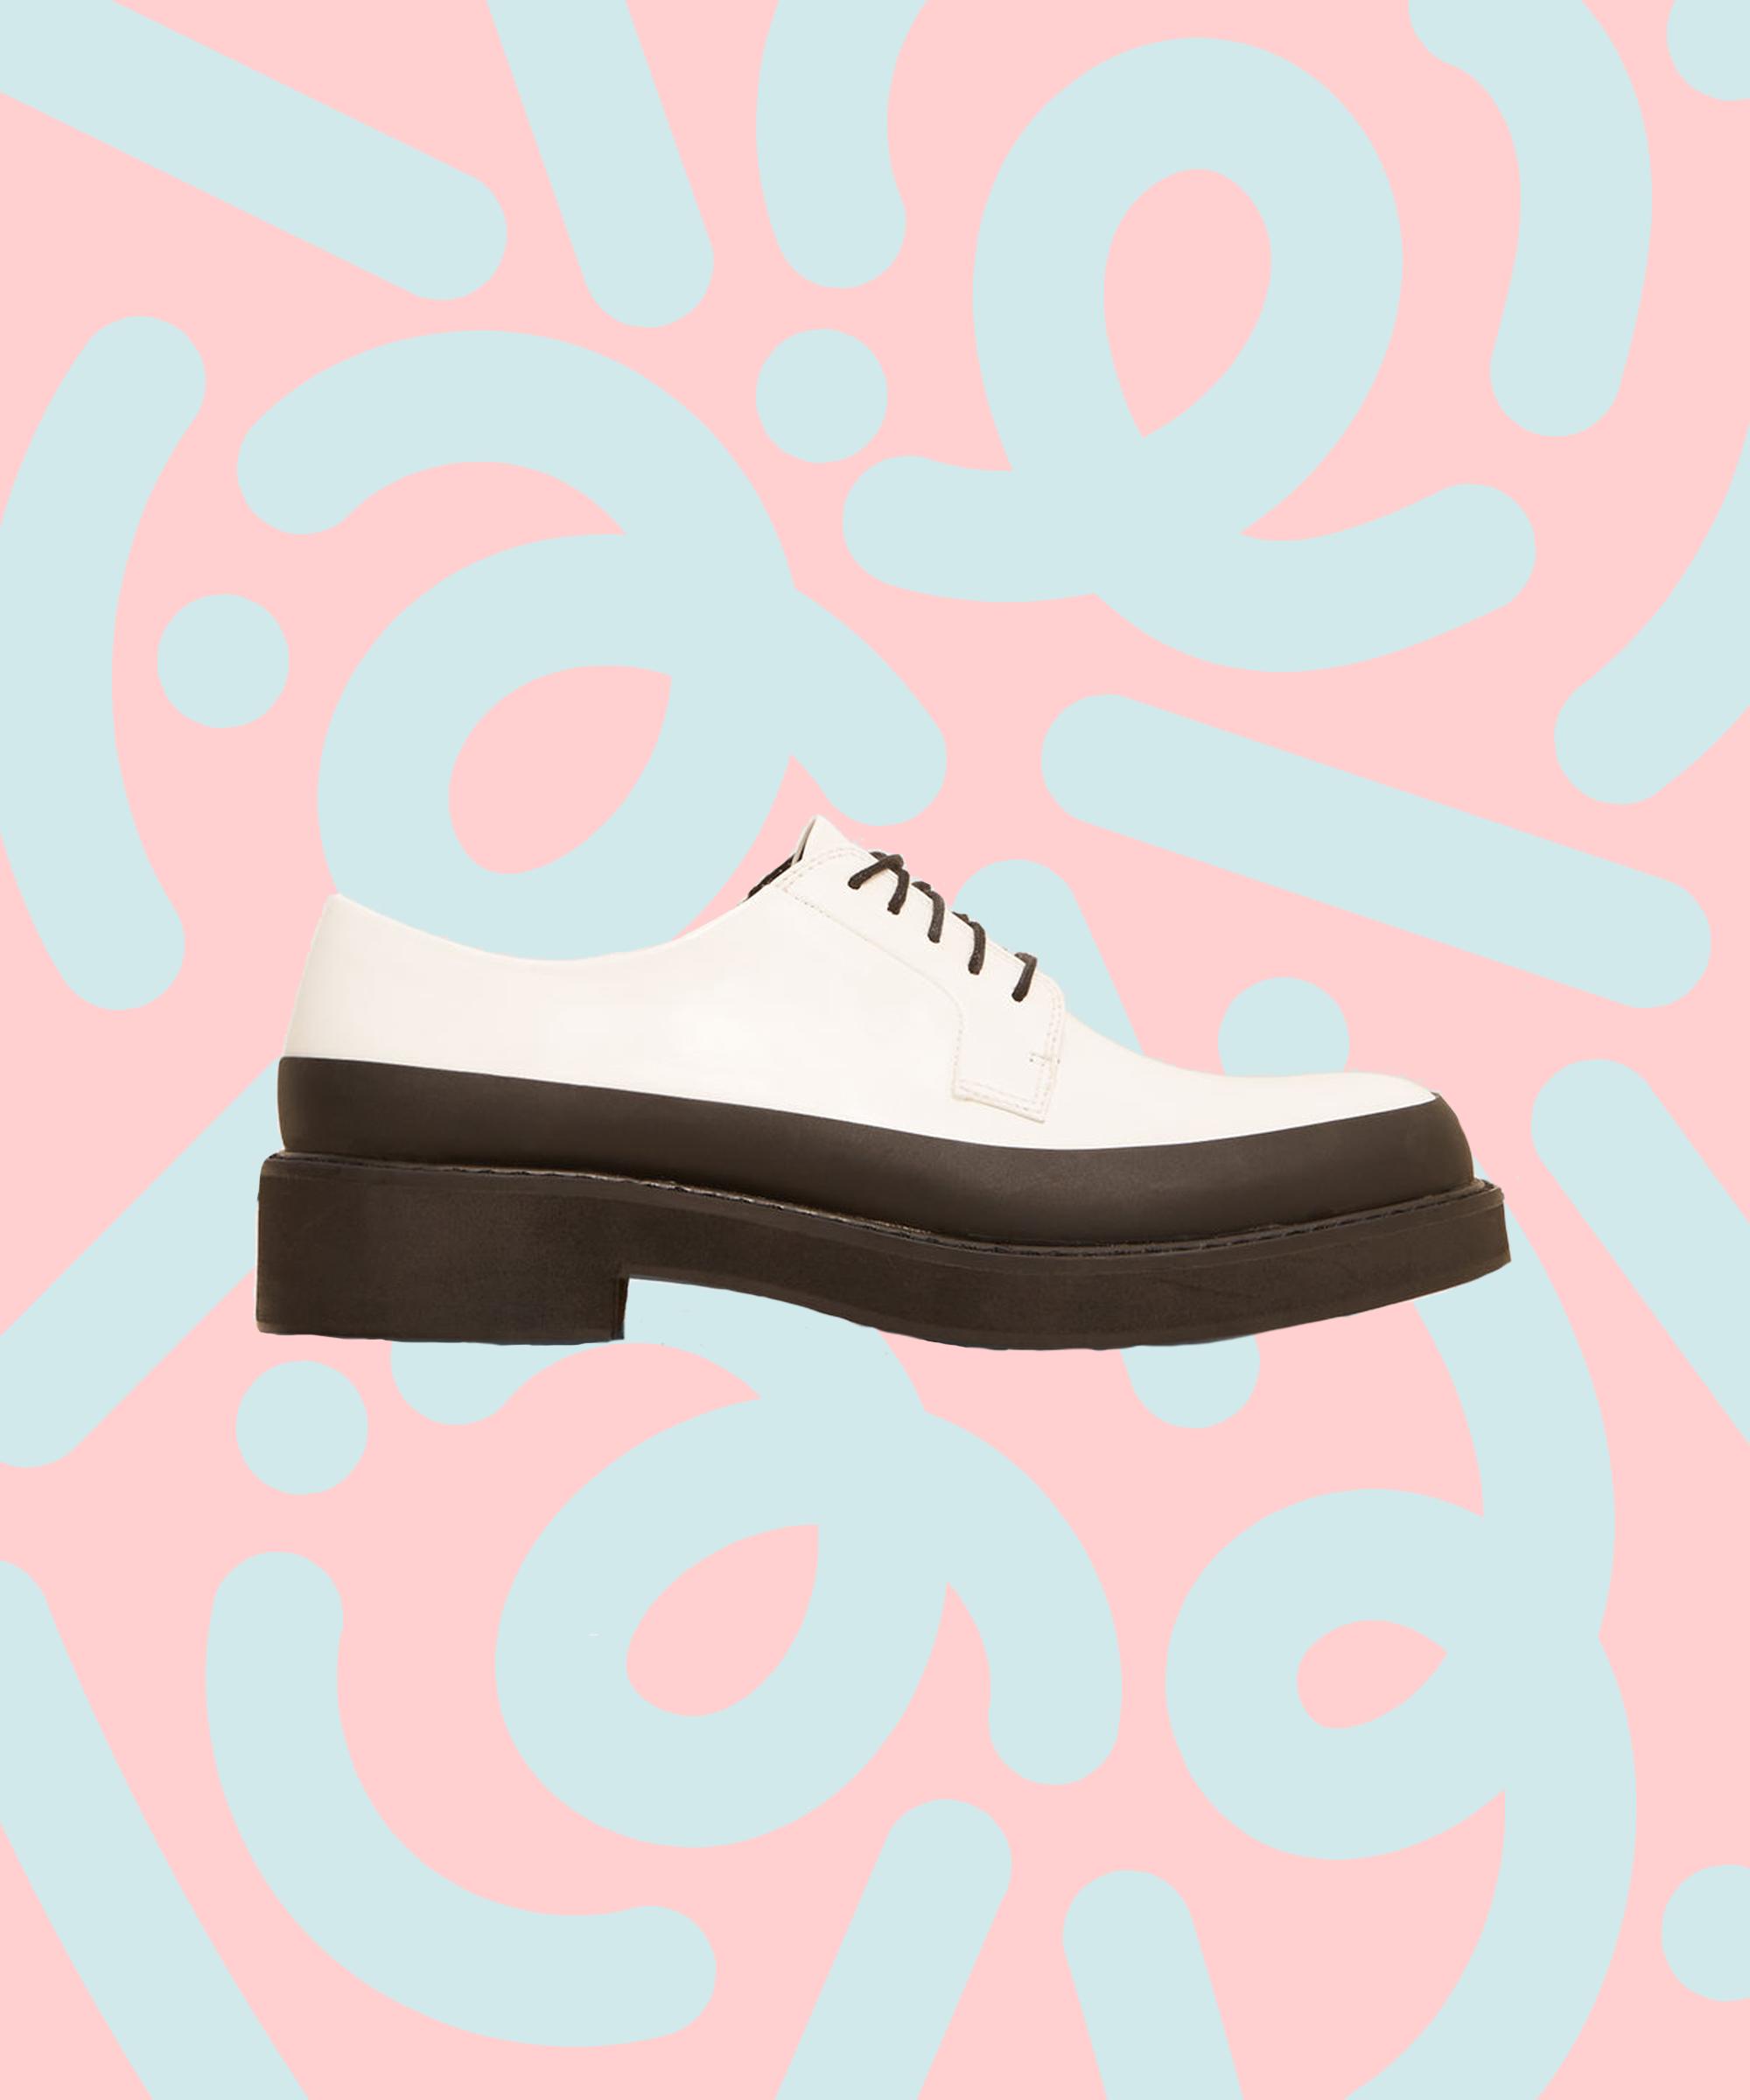 Fall Accessories - Platform Shoes Flat Mules